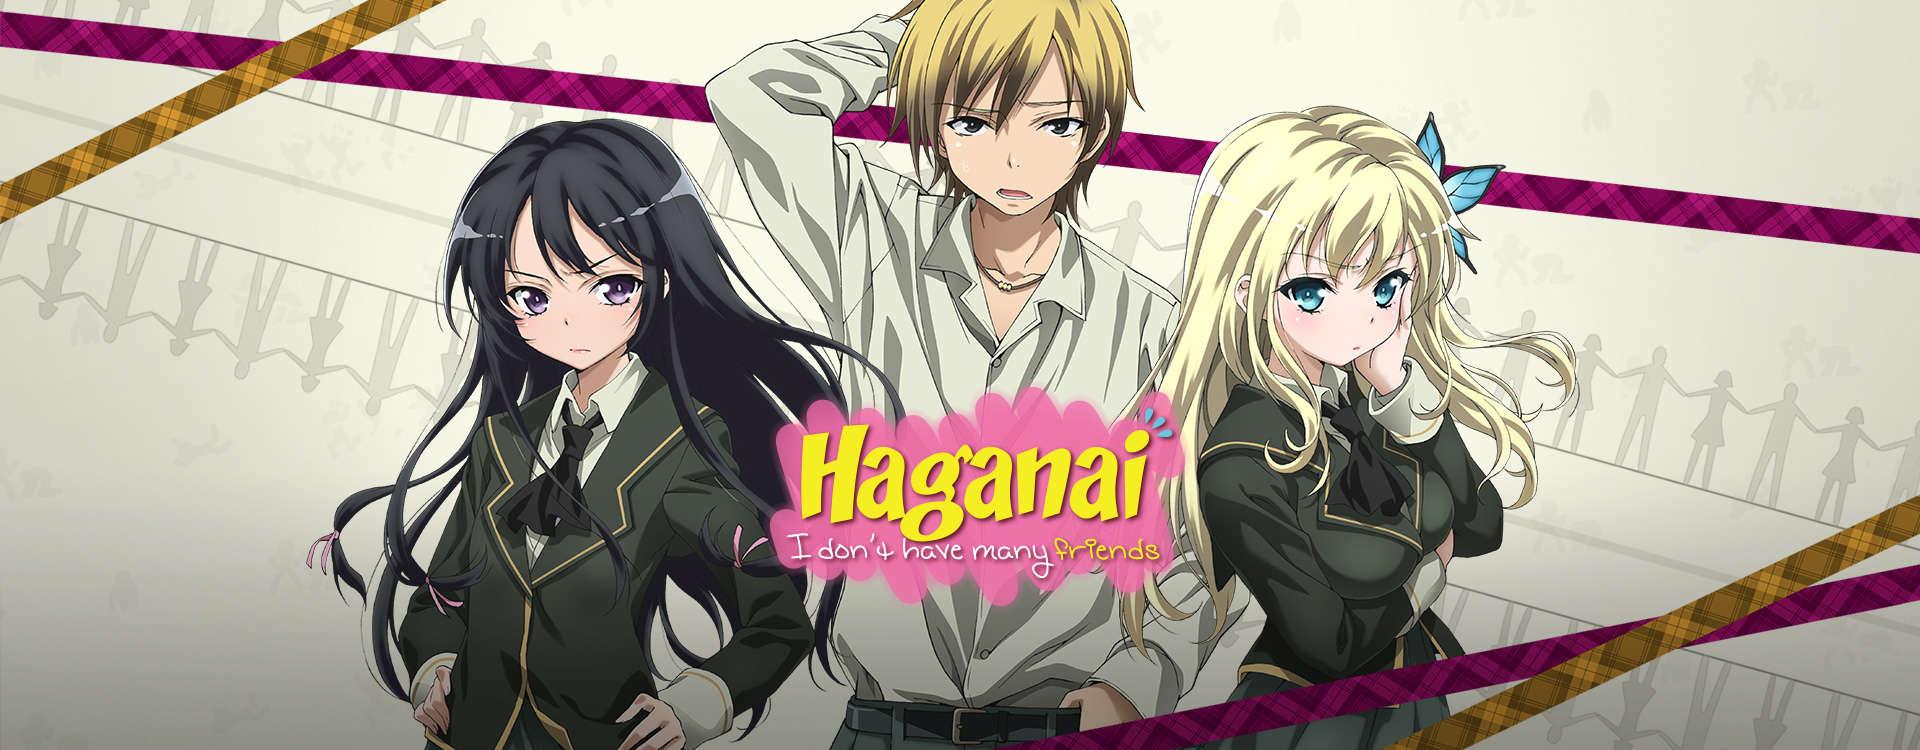 Haganai